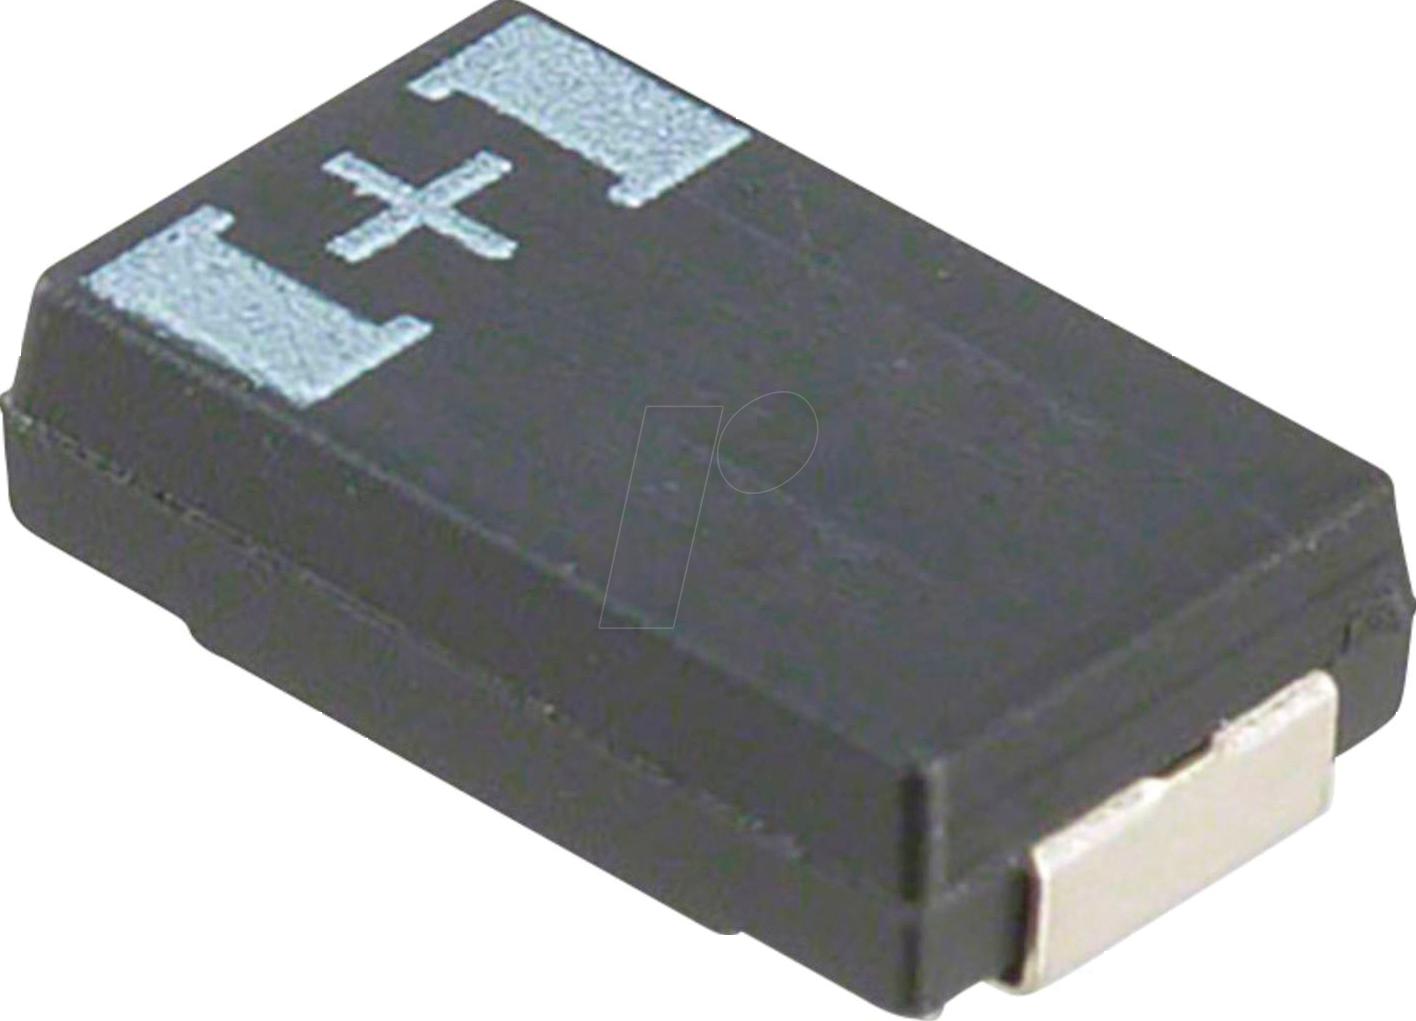 PAN 6TPB68M - Tantalkondensator, 68 µF, V